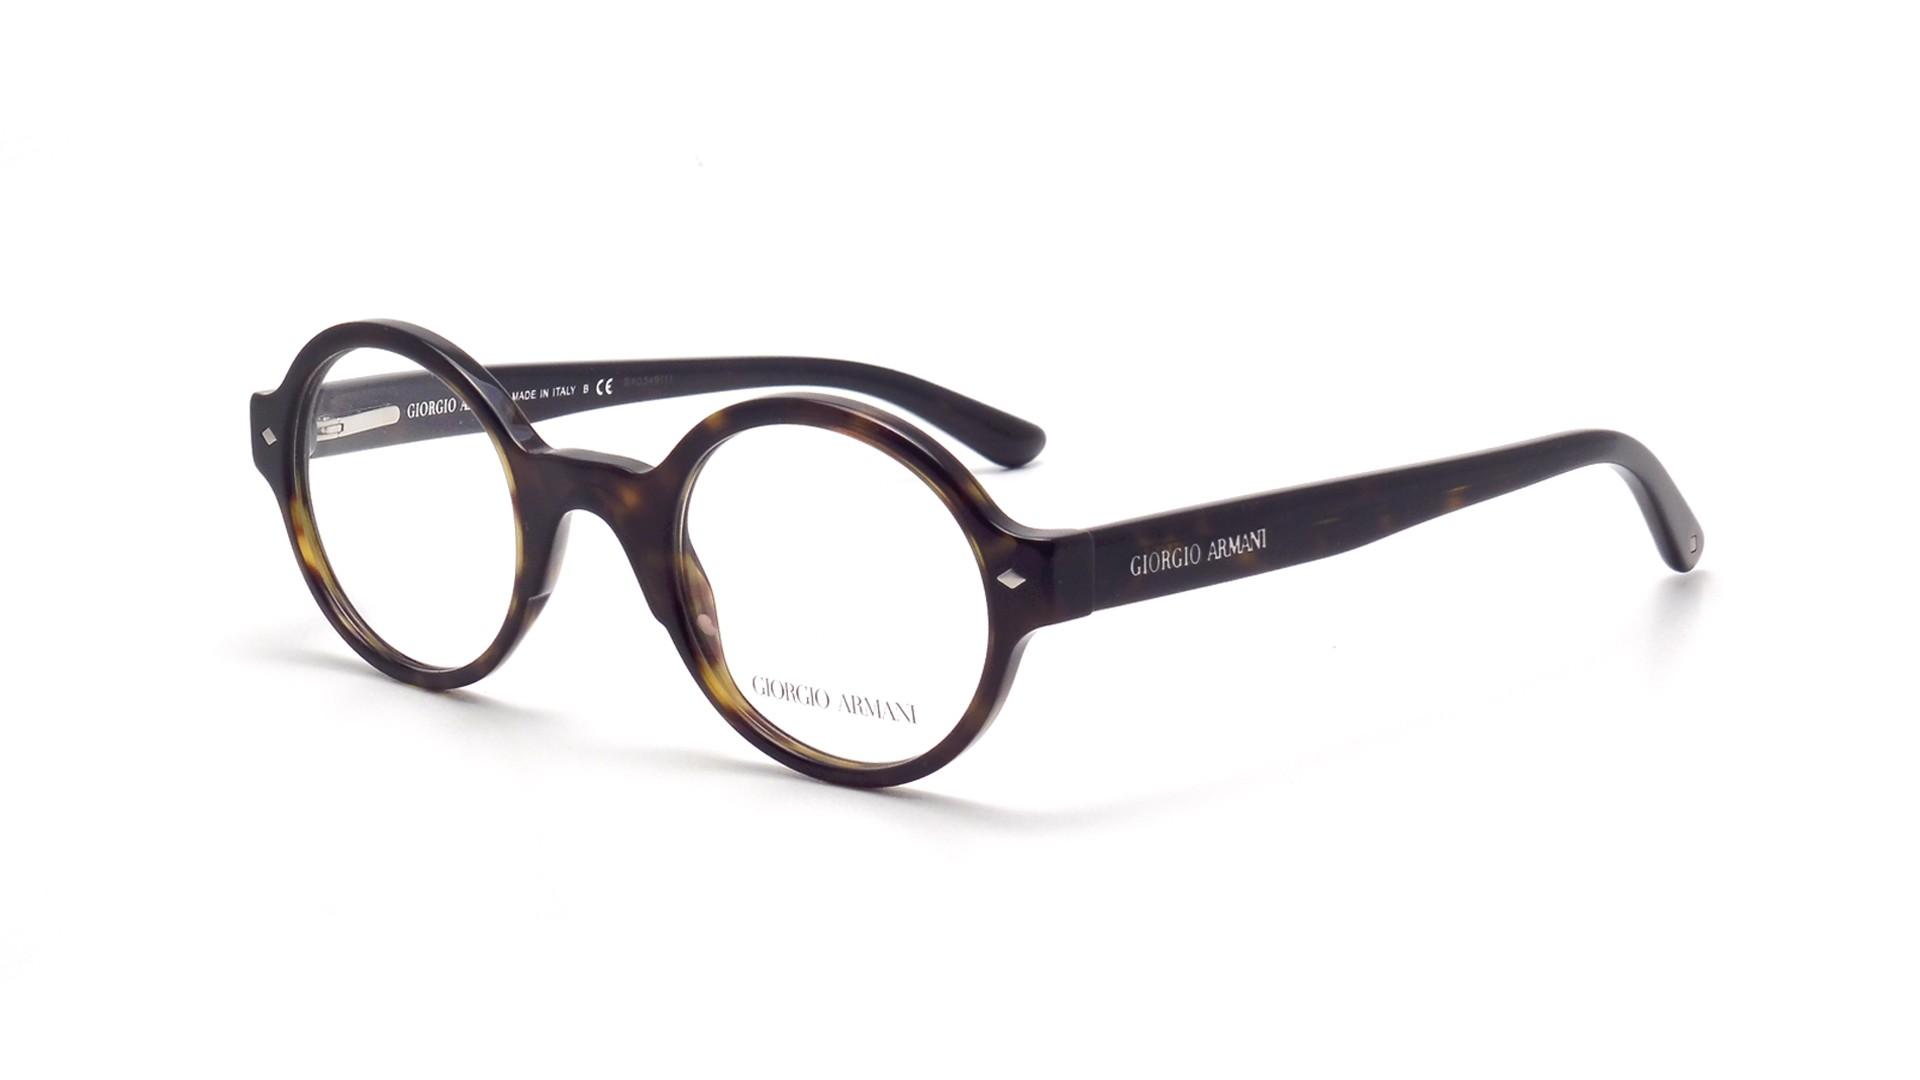 Giorgio Armani Eyeglass Frame Repair